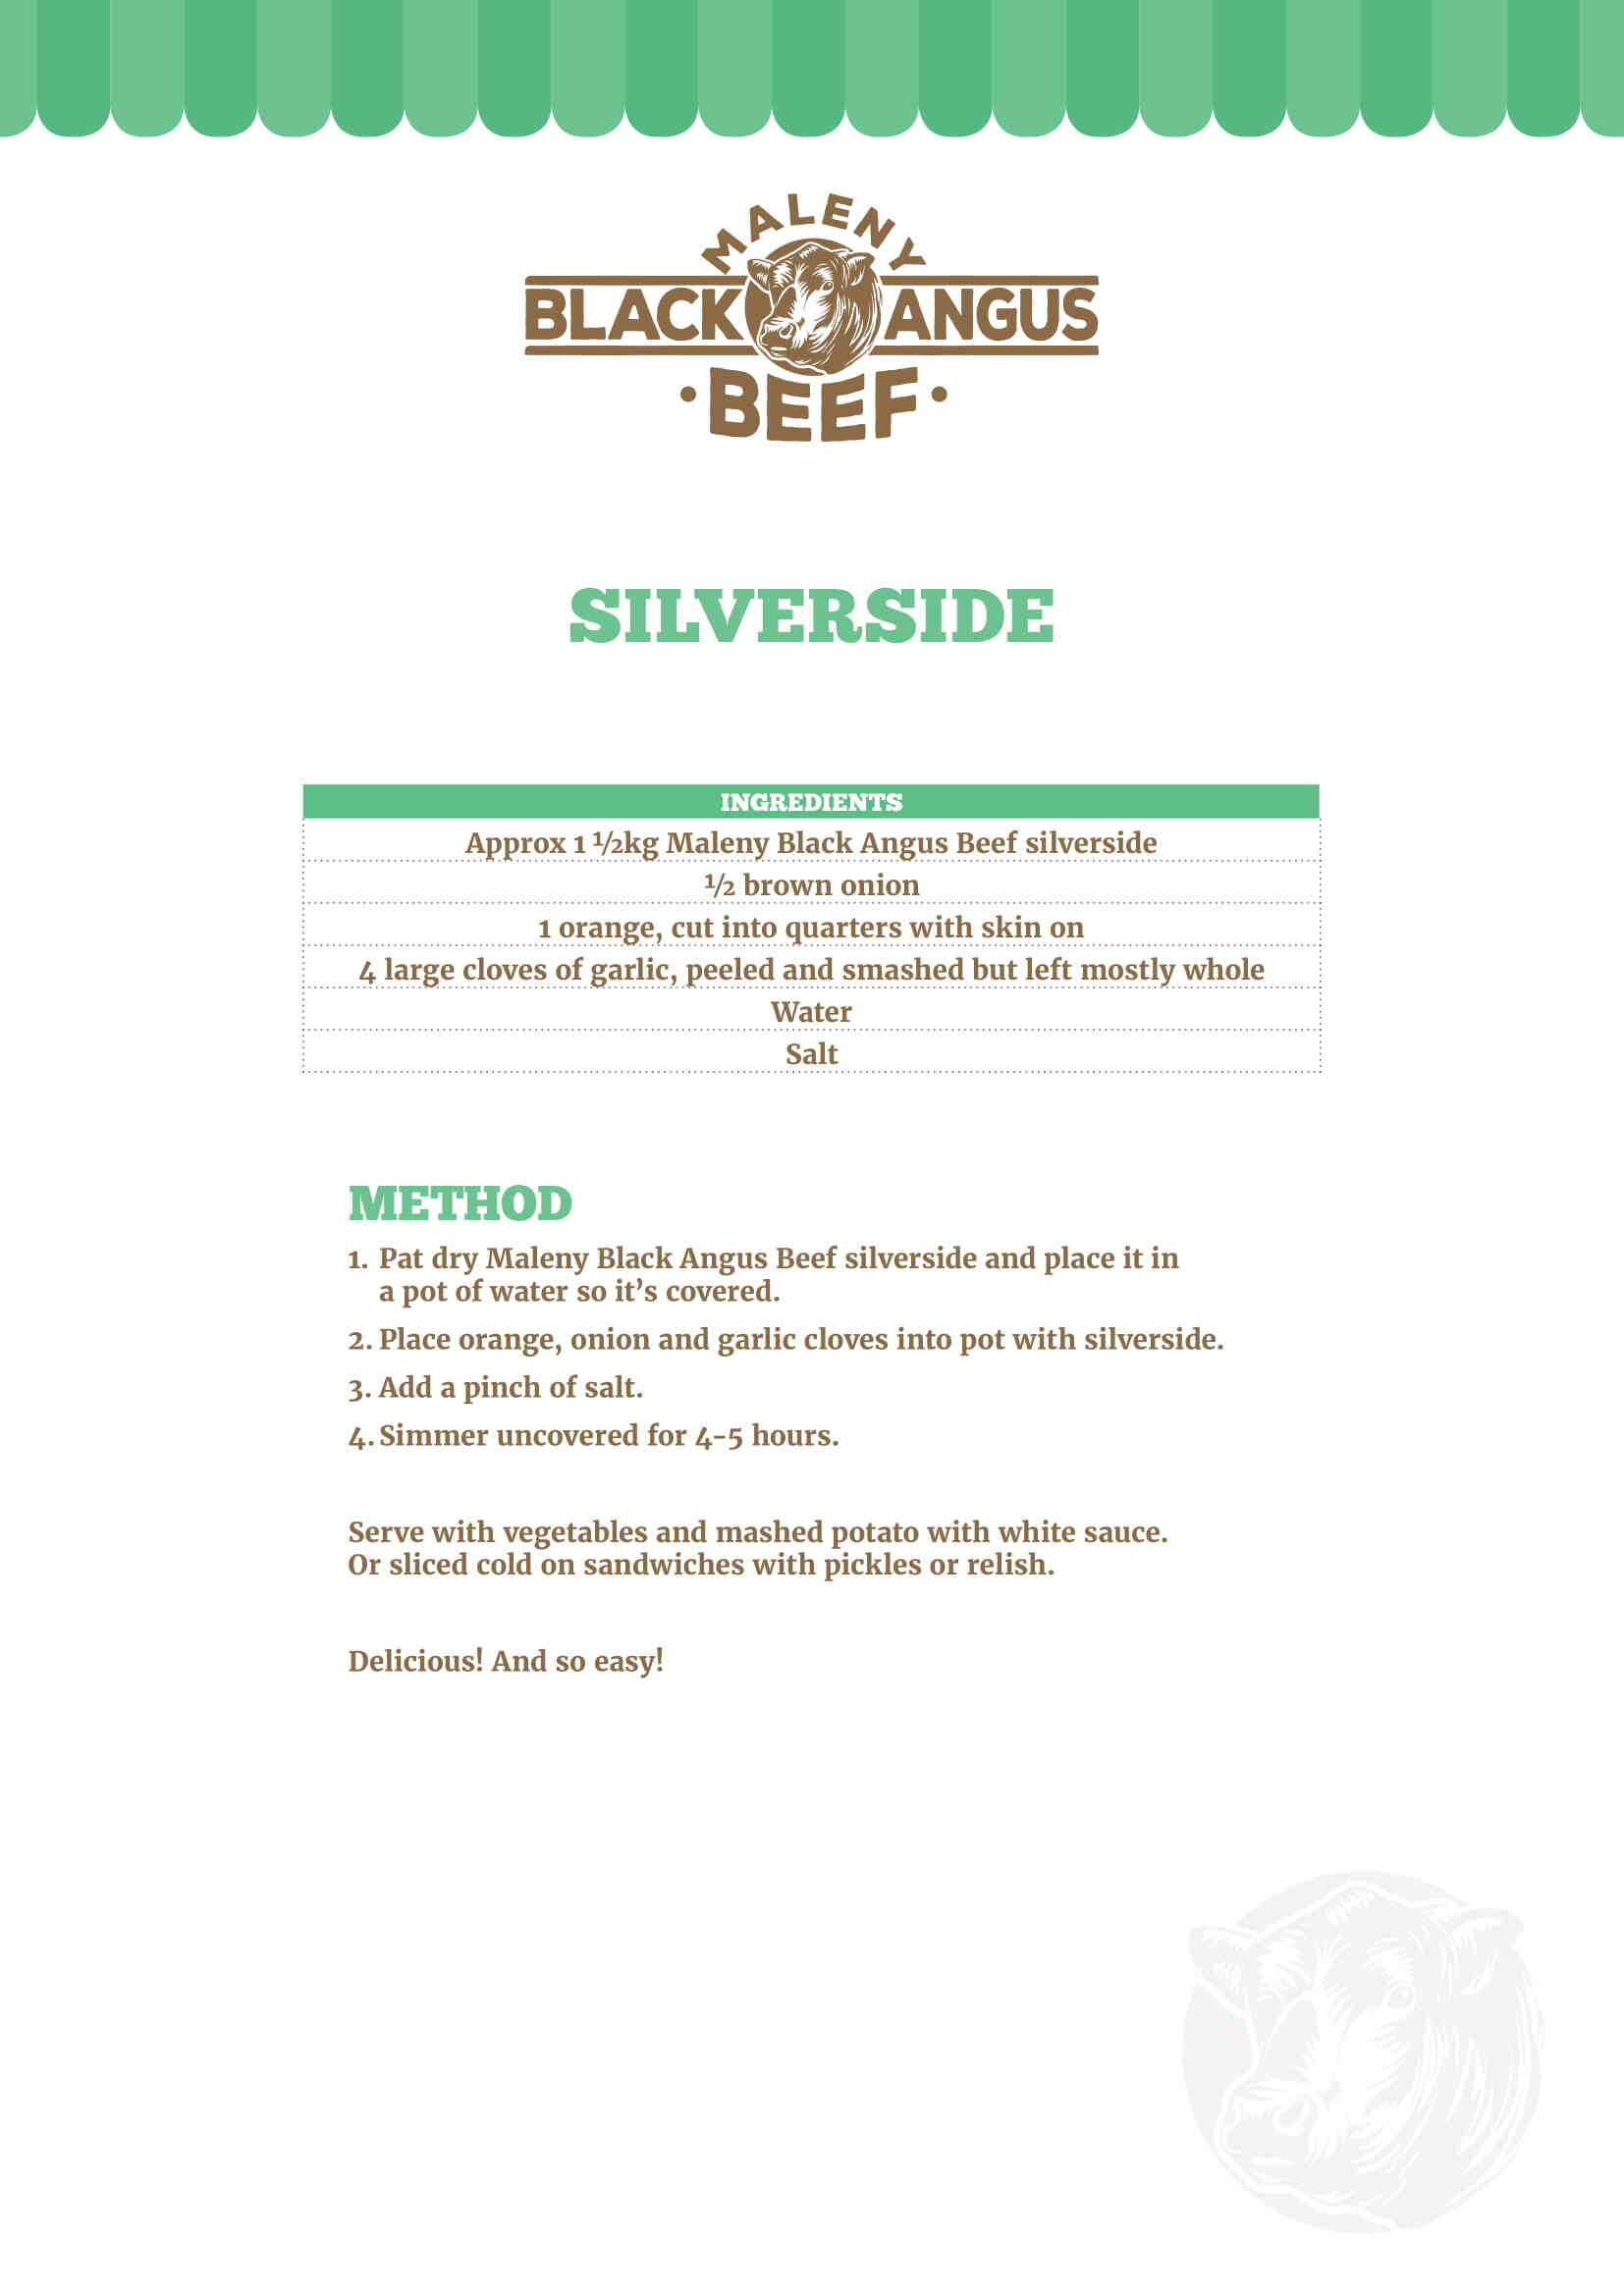 Silverside in a white plate